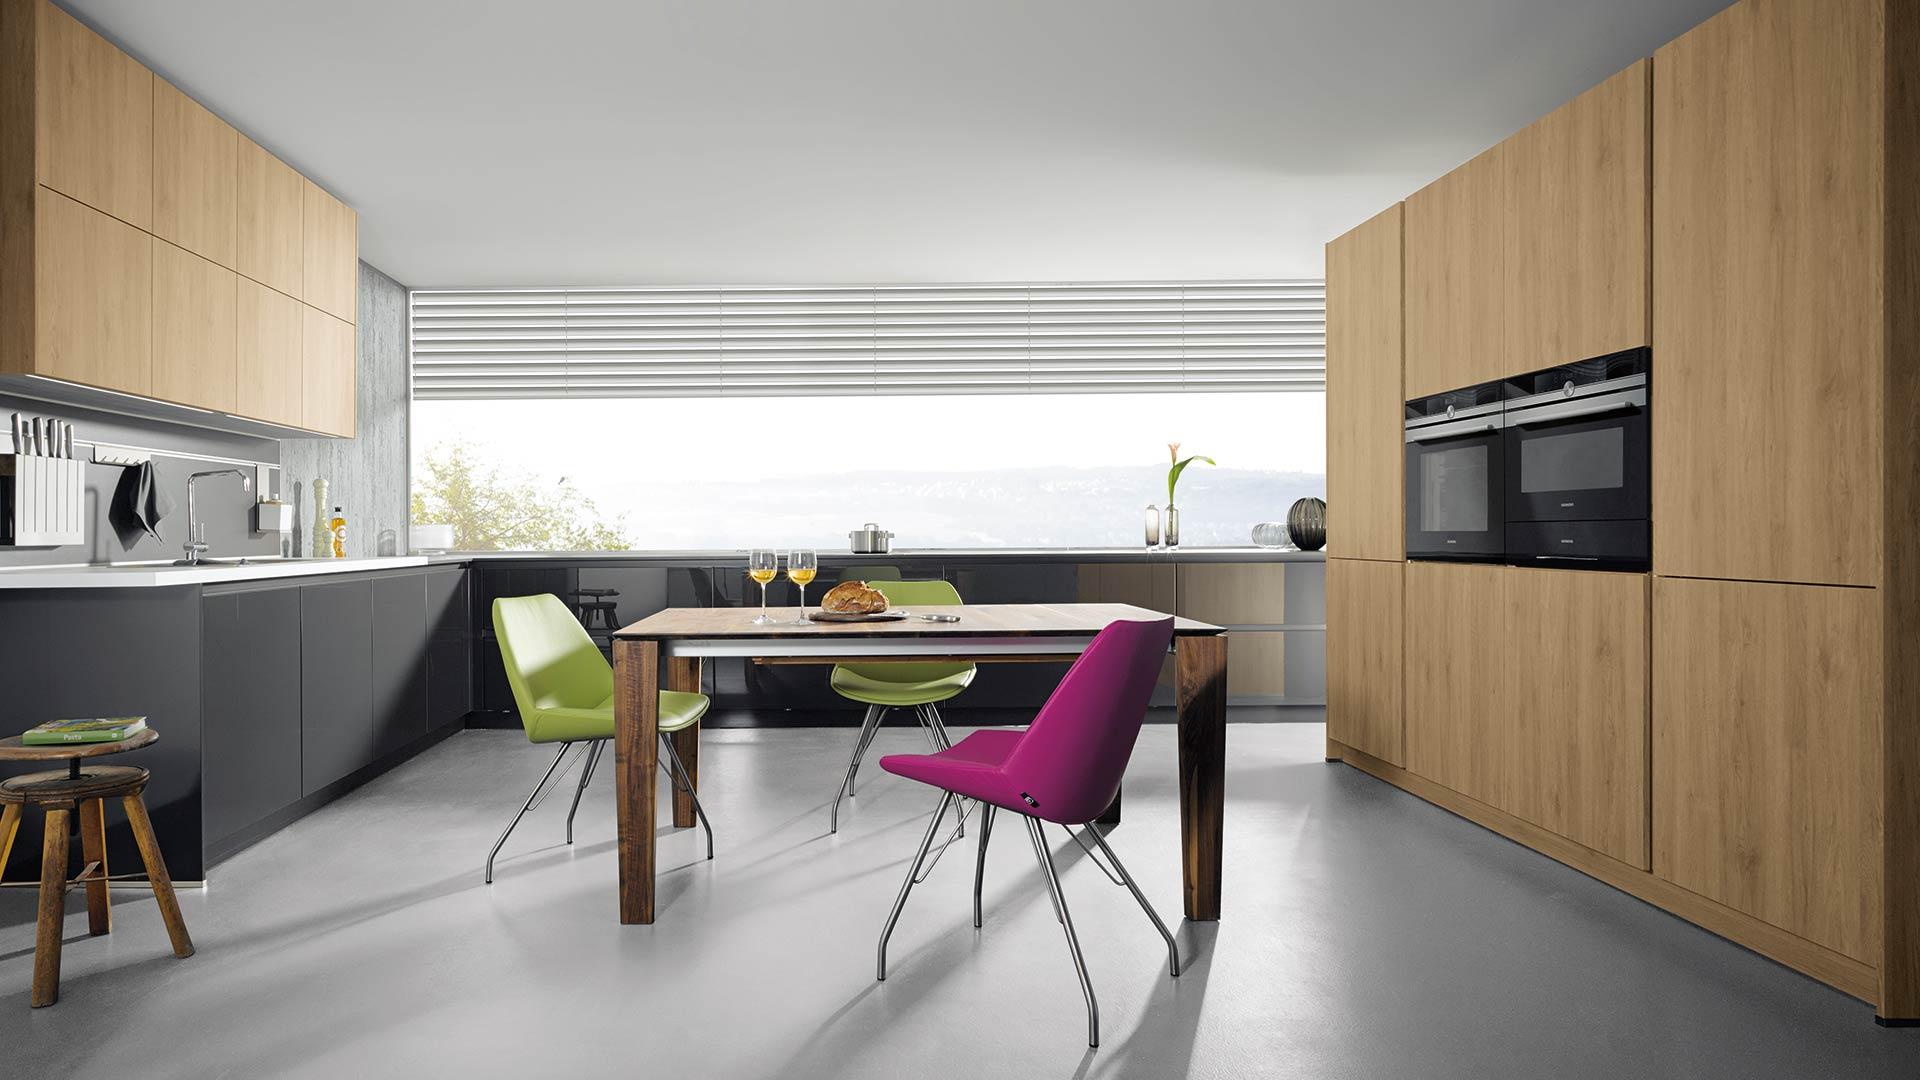 k chenstudio deggendorf tische f r die k che. Black Bedroom Furniture Sets. Home Design Ideas